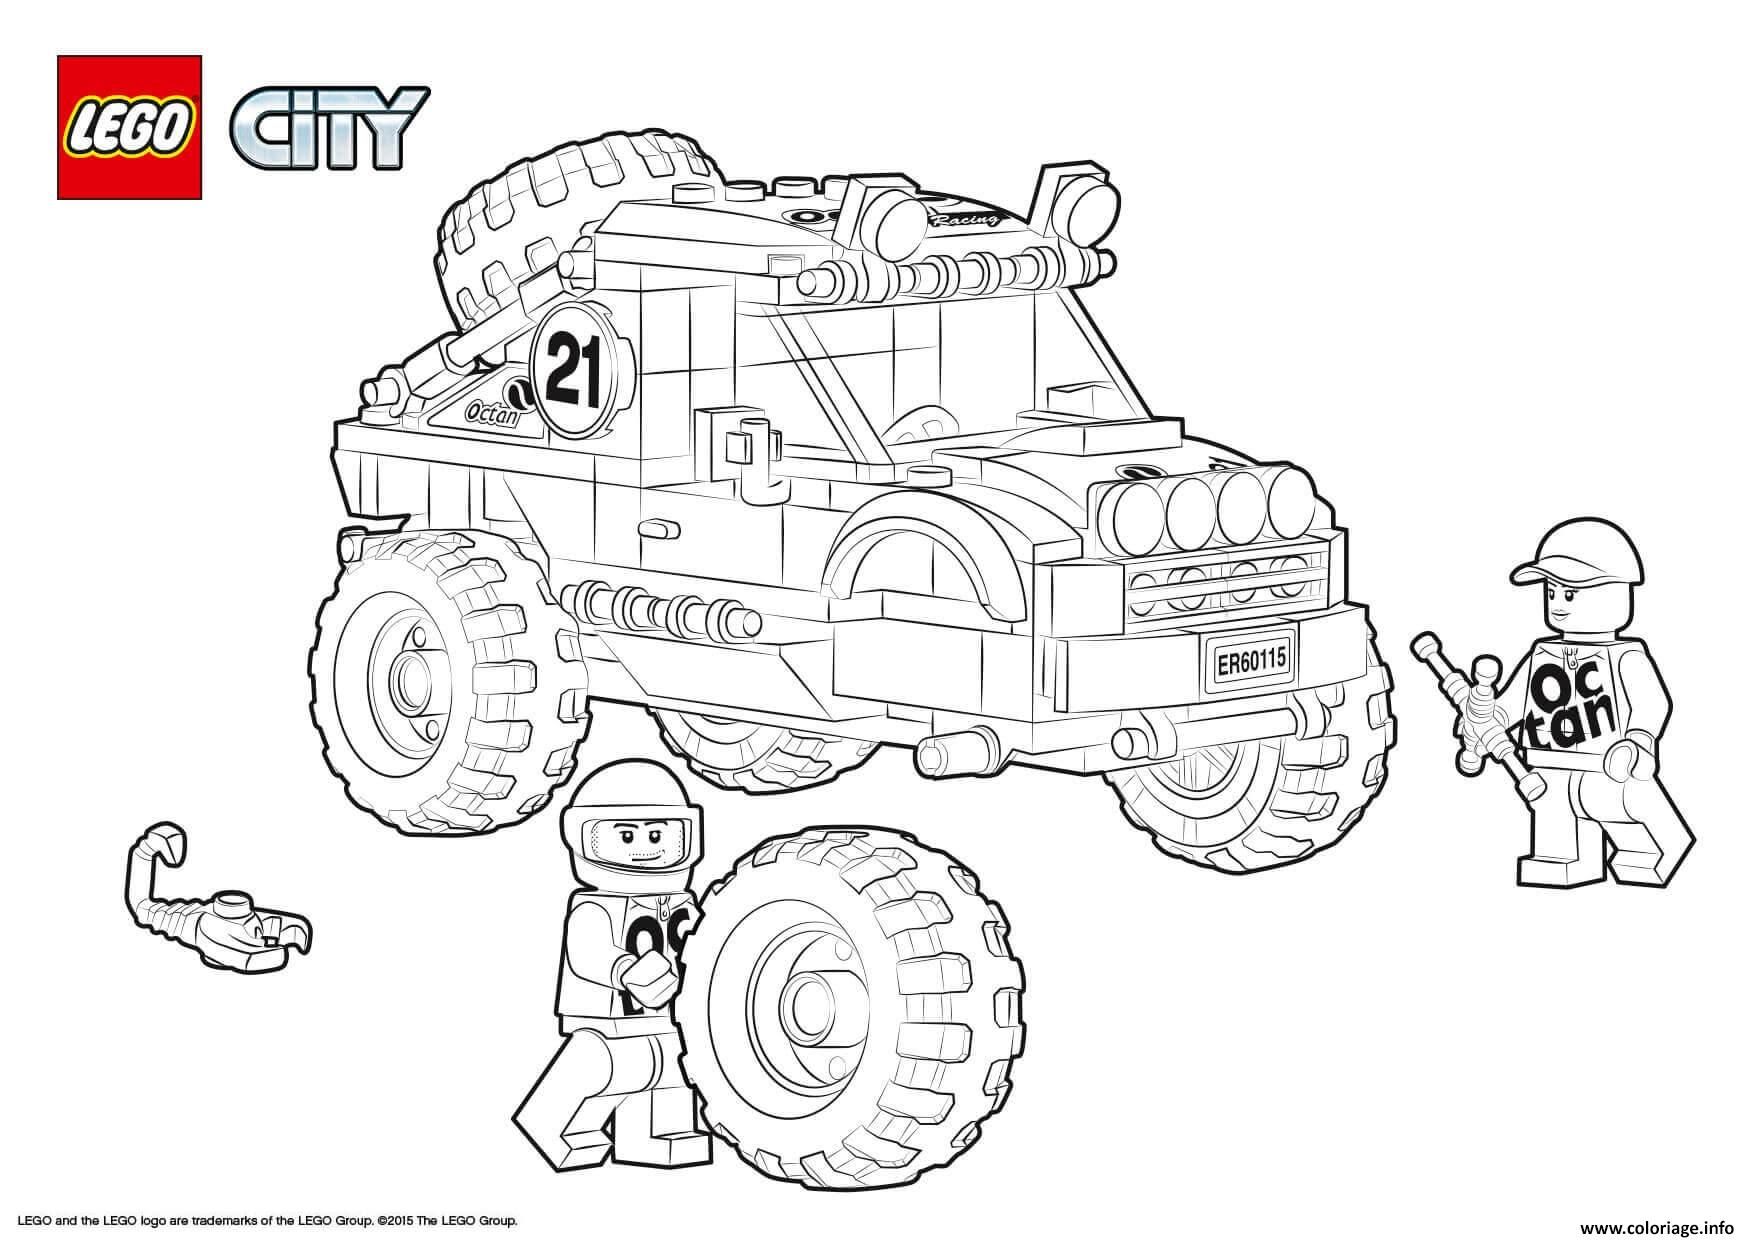 Coloriage Lego City 4x4 Off Roader Jecolorie Com